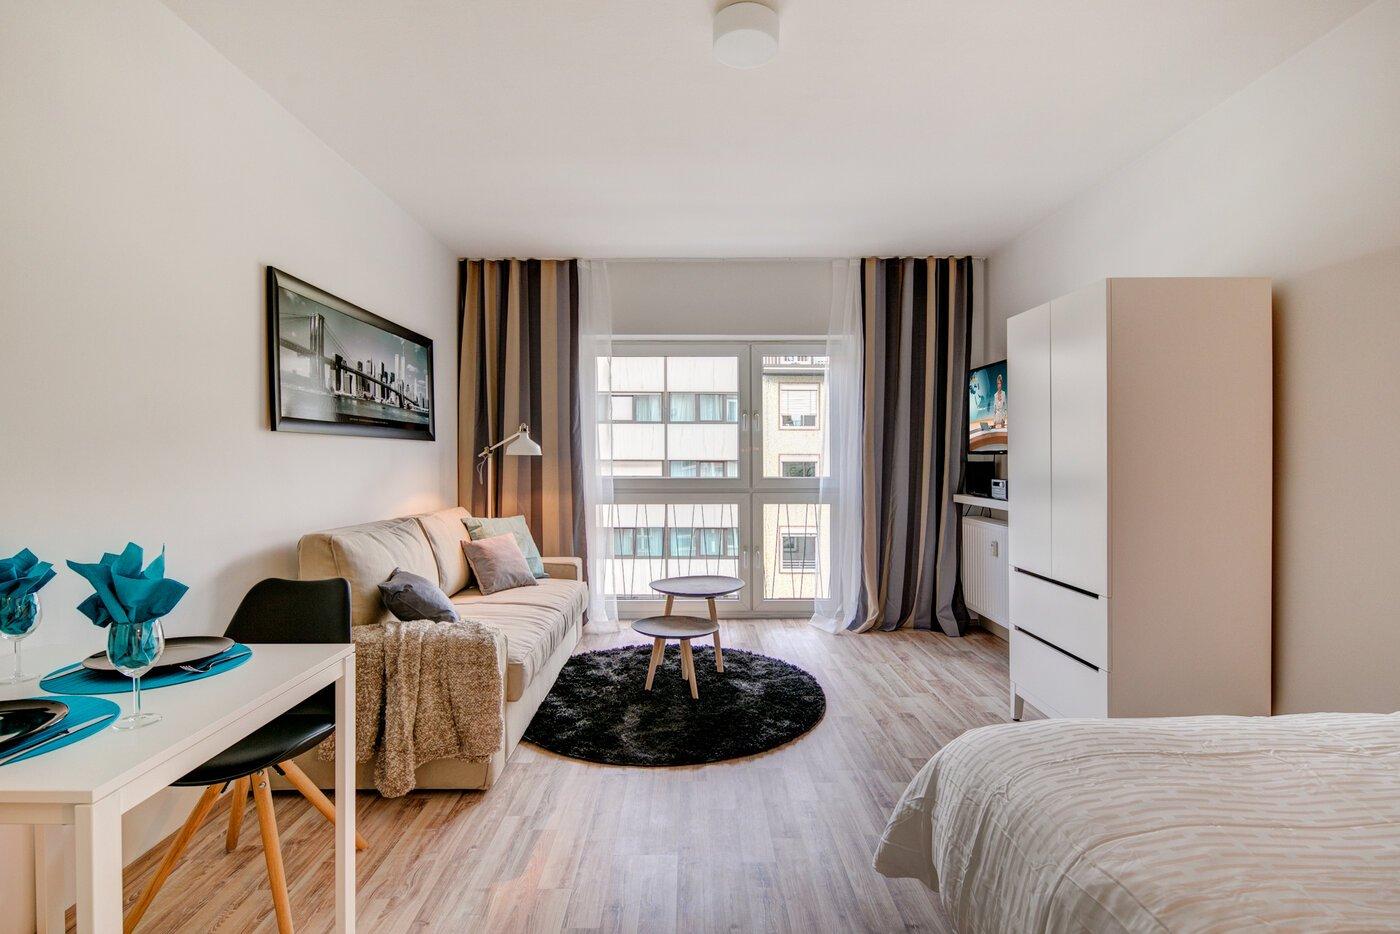 1 habitaci n piso amueblado internet tarifa plana m nich ludwigsvorstadt 9865. Black Bedroom Furniture Sets. Home Design Ideas